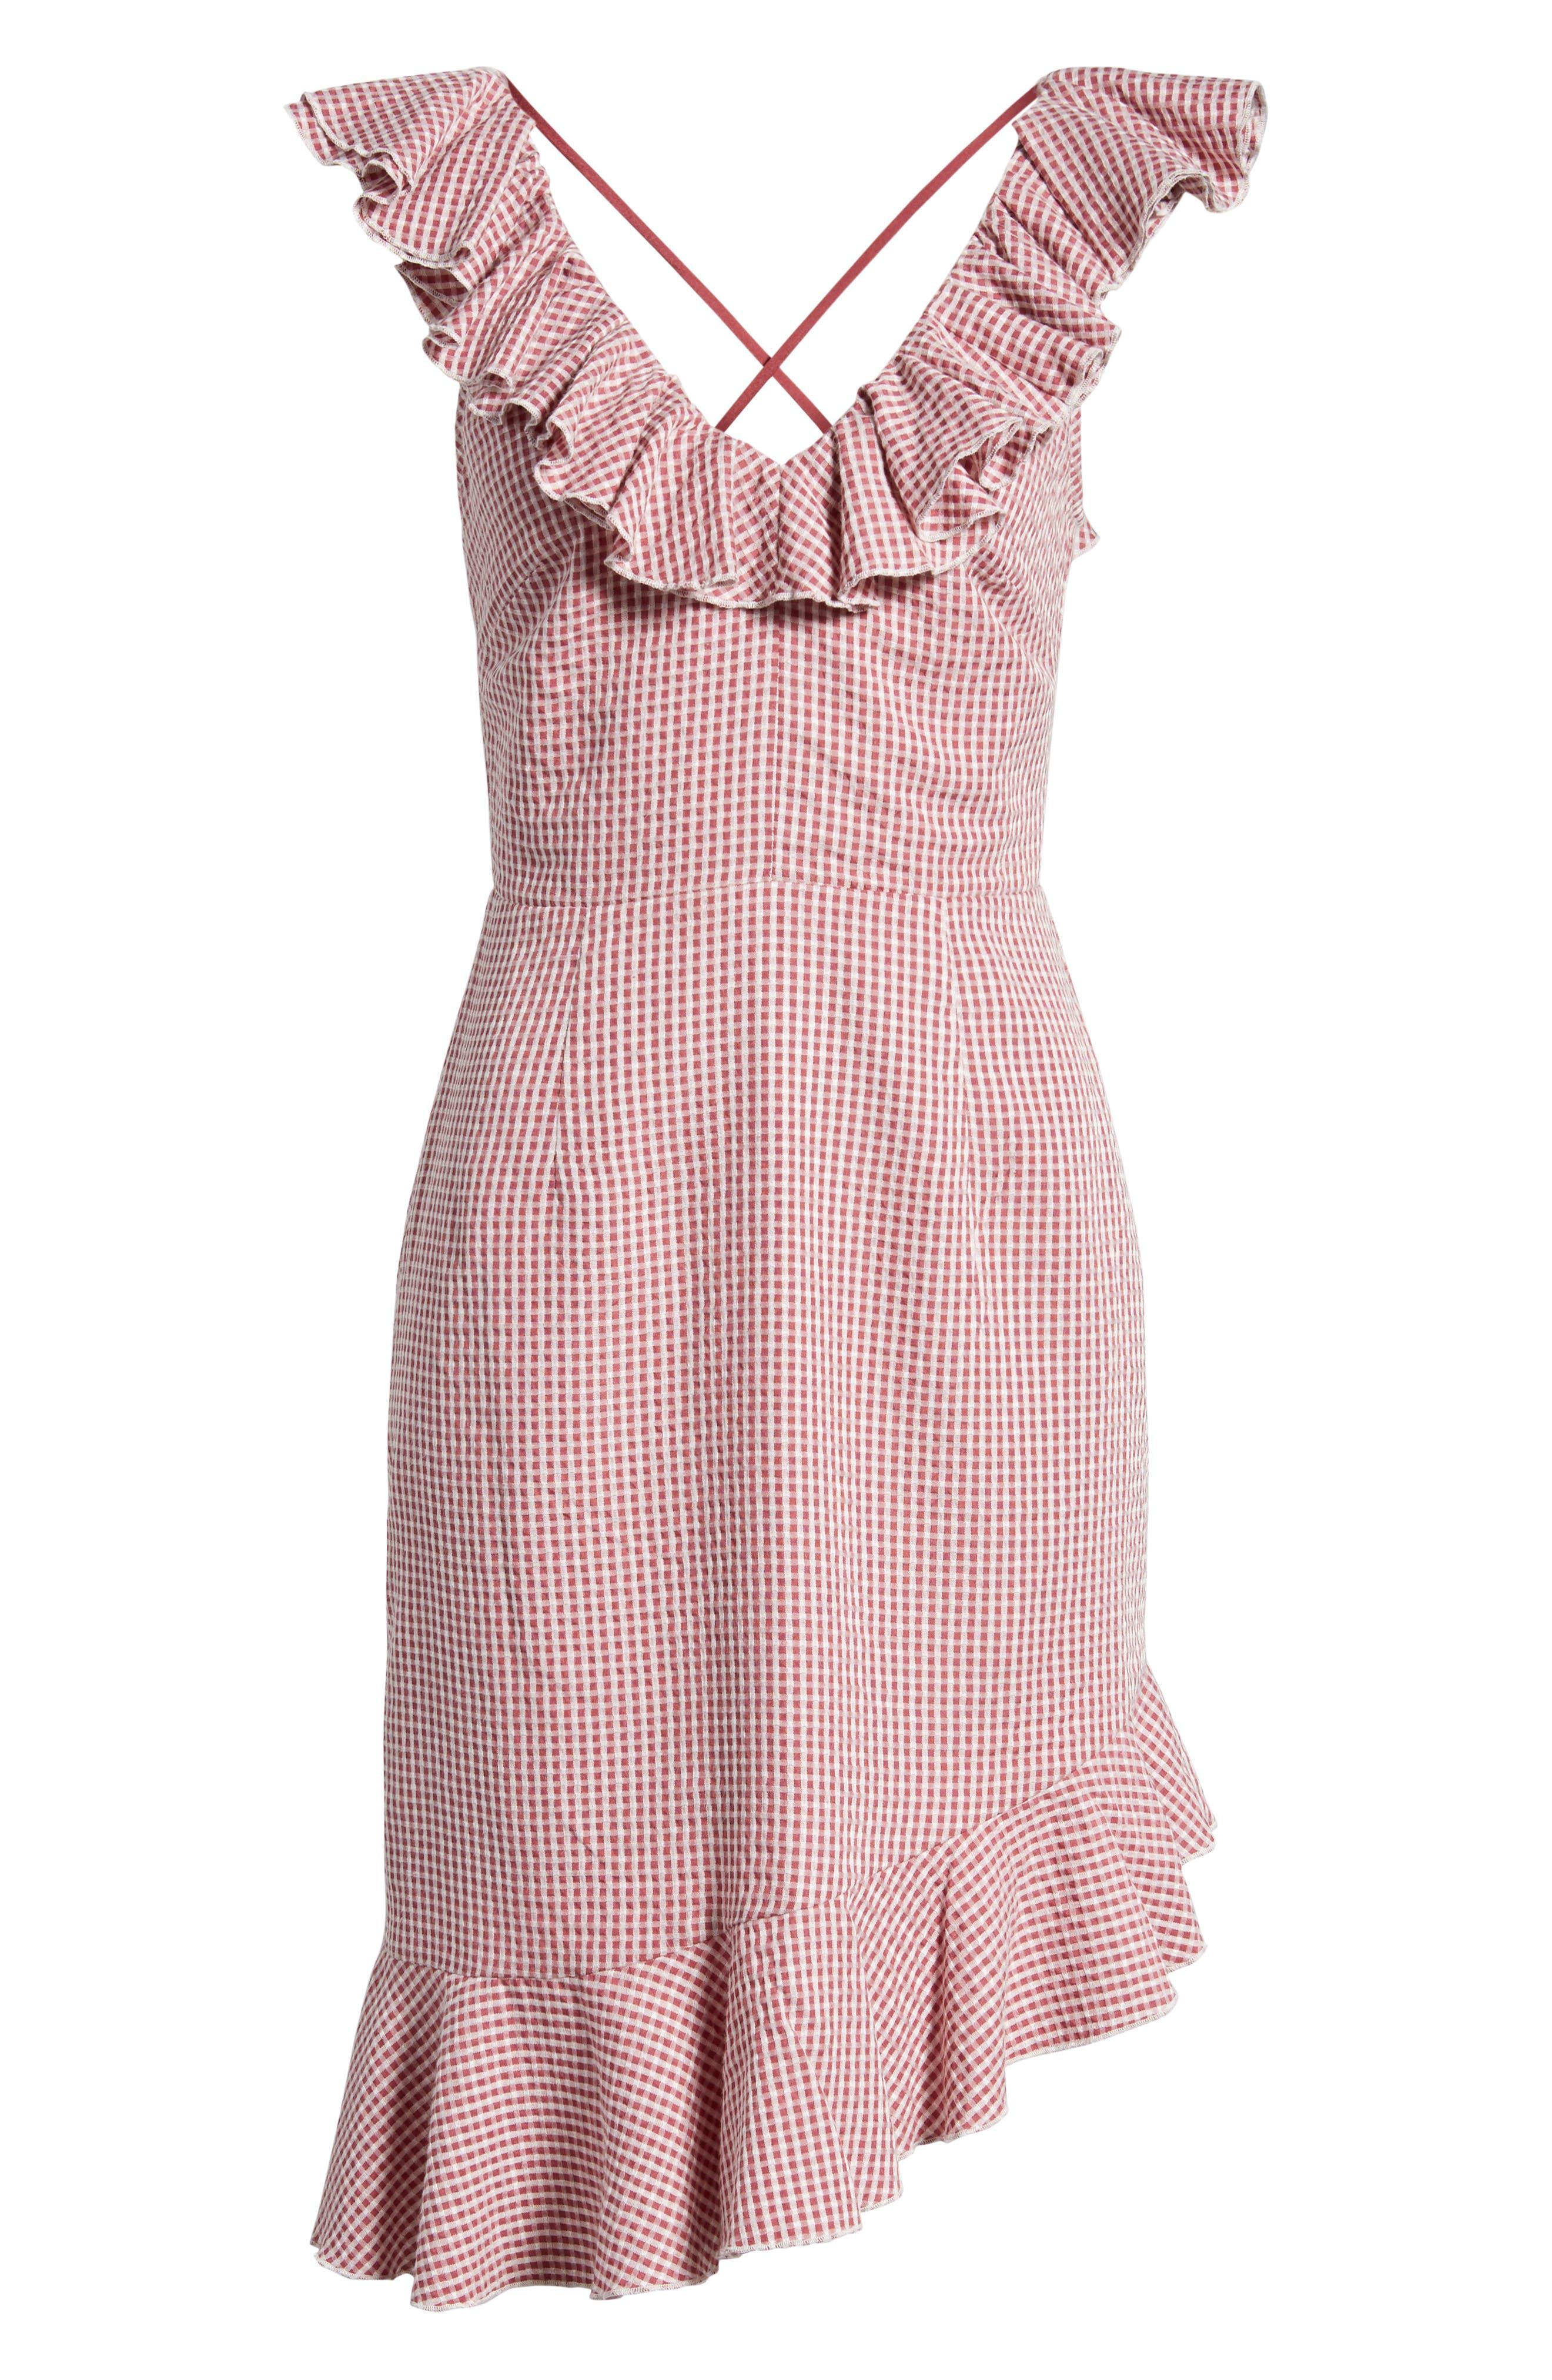 Asymmetrical Ruffle Dress,                             Alternate thumbnail 7, color,                             Red Gingham